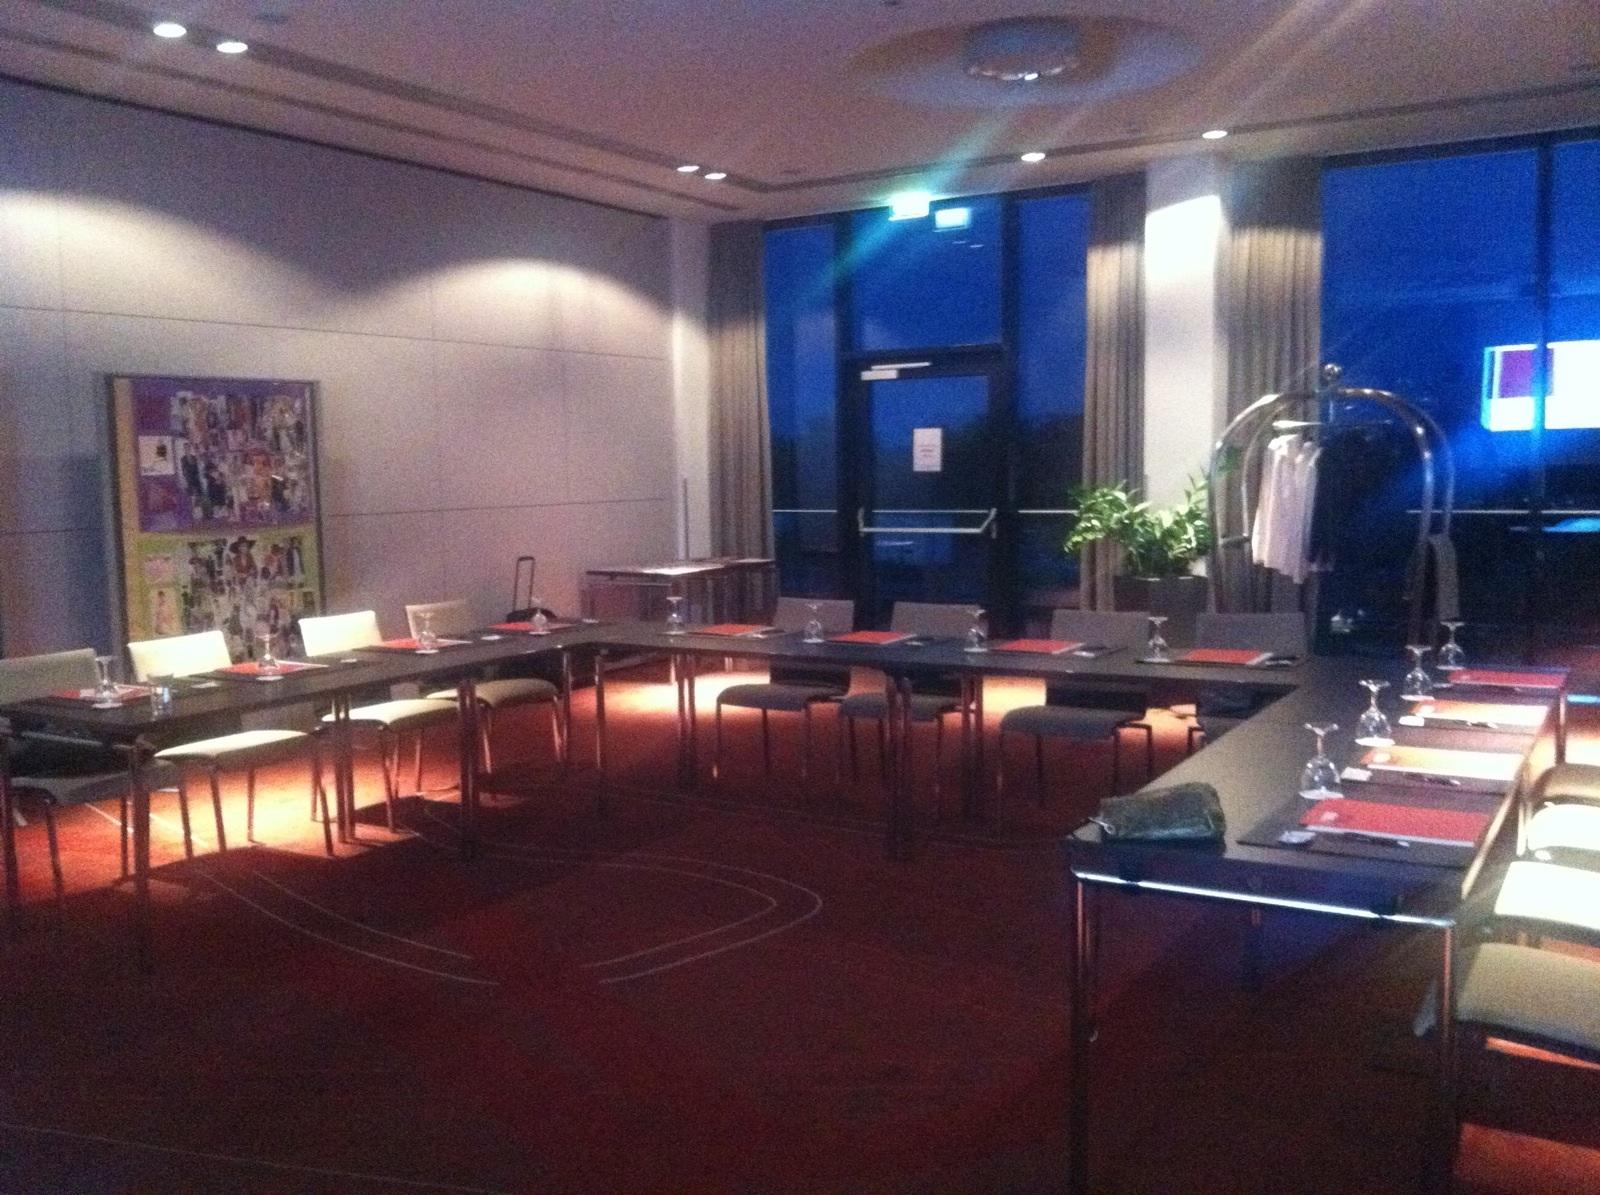 Unser Seminar-Raum im Lindner Congress & Motorsport-Hotel am Nürburgring